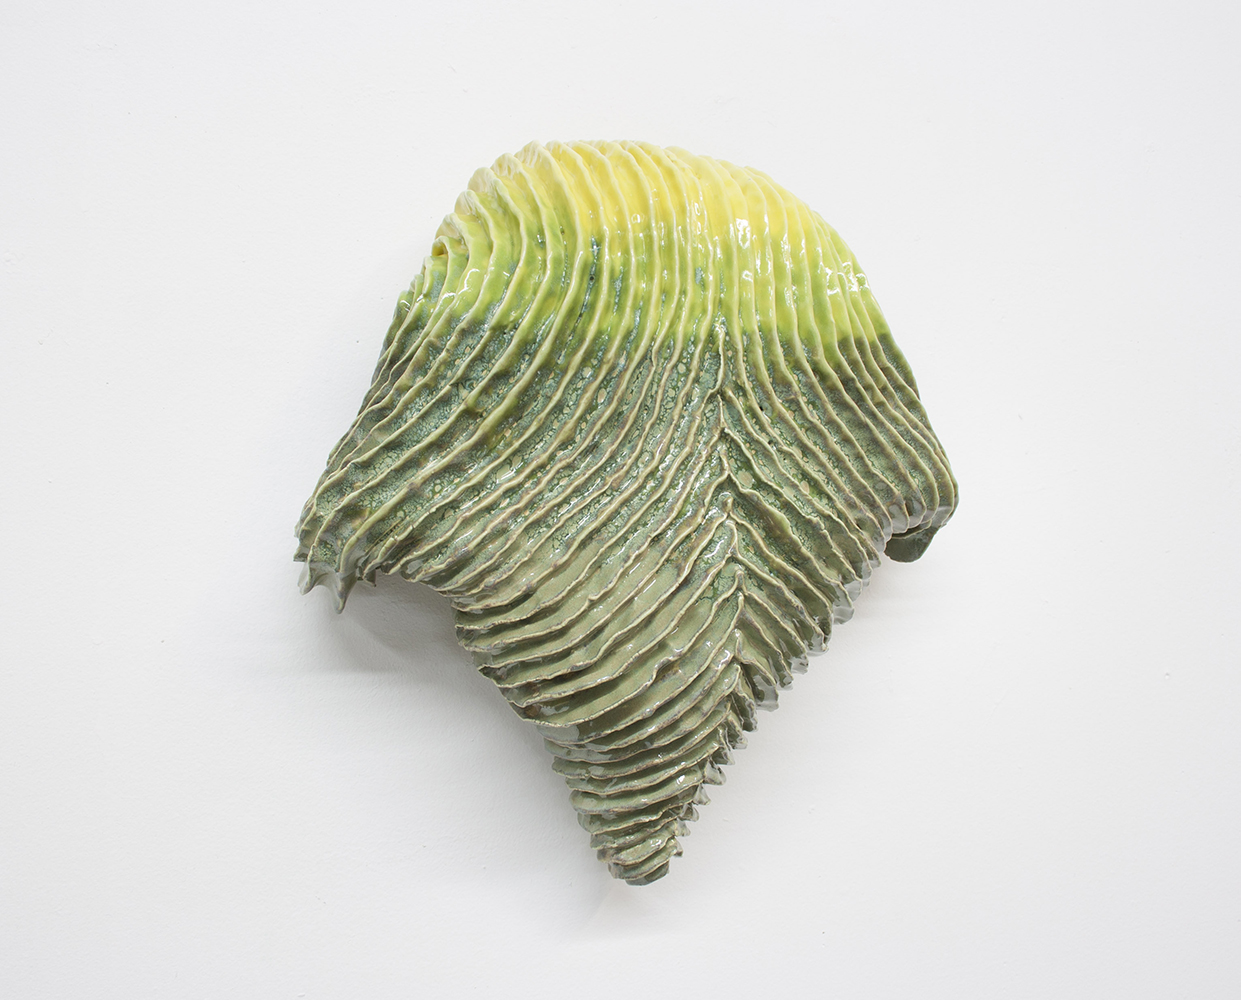 "Philippe Caron Lefebvre,  Tachypleus tridentatus nouveau genre , 2018, ceramic and glaze,12"" x 11,5"" x 5"" (30.5 x 29 x 13 cm)."